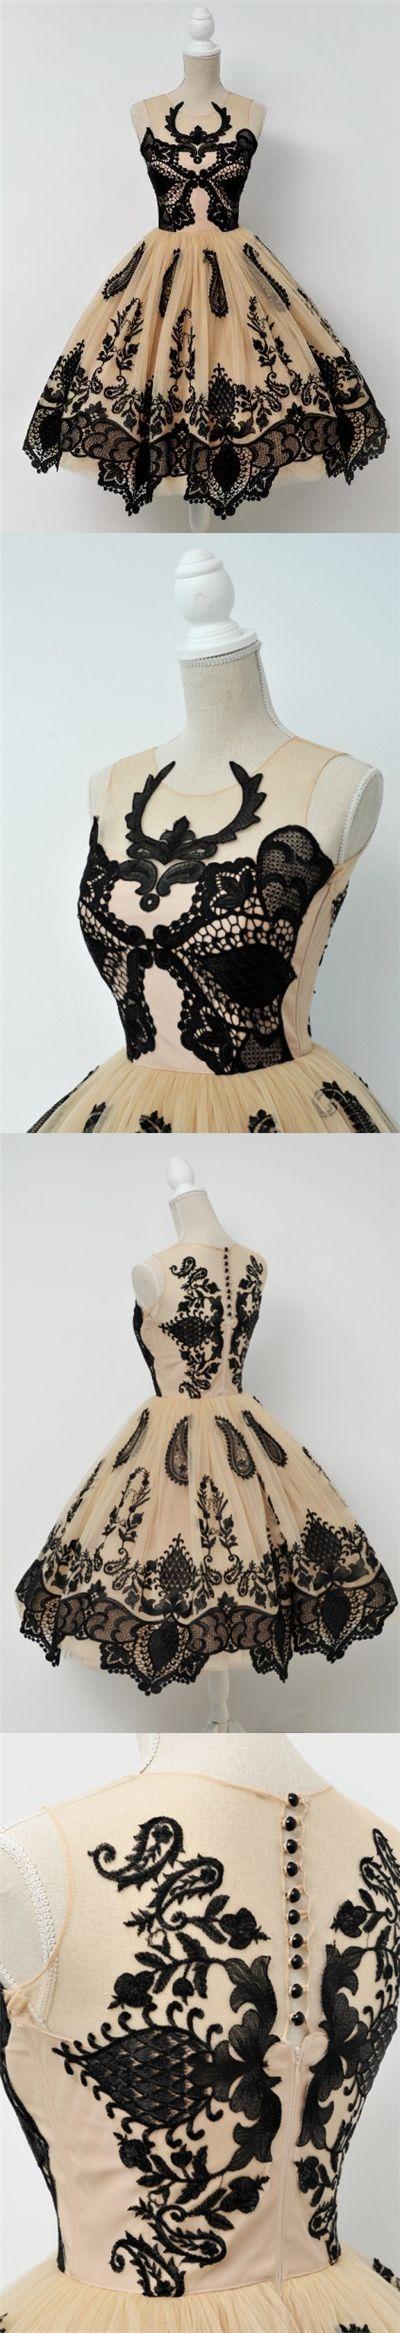 Vintage Homecoming Dress Black Appliques Tulle Short Prom Dress Party Dress JK300